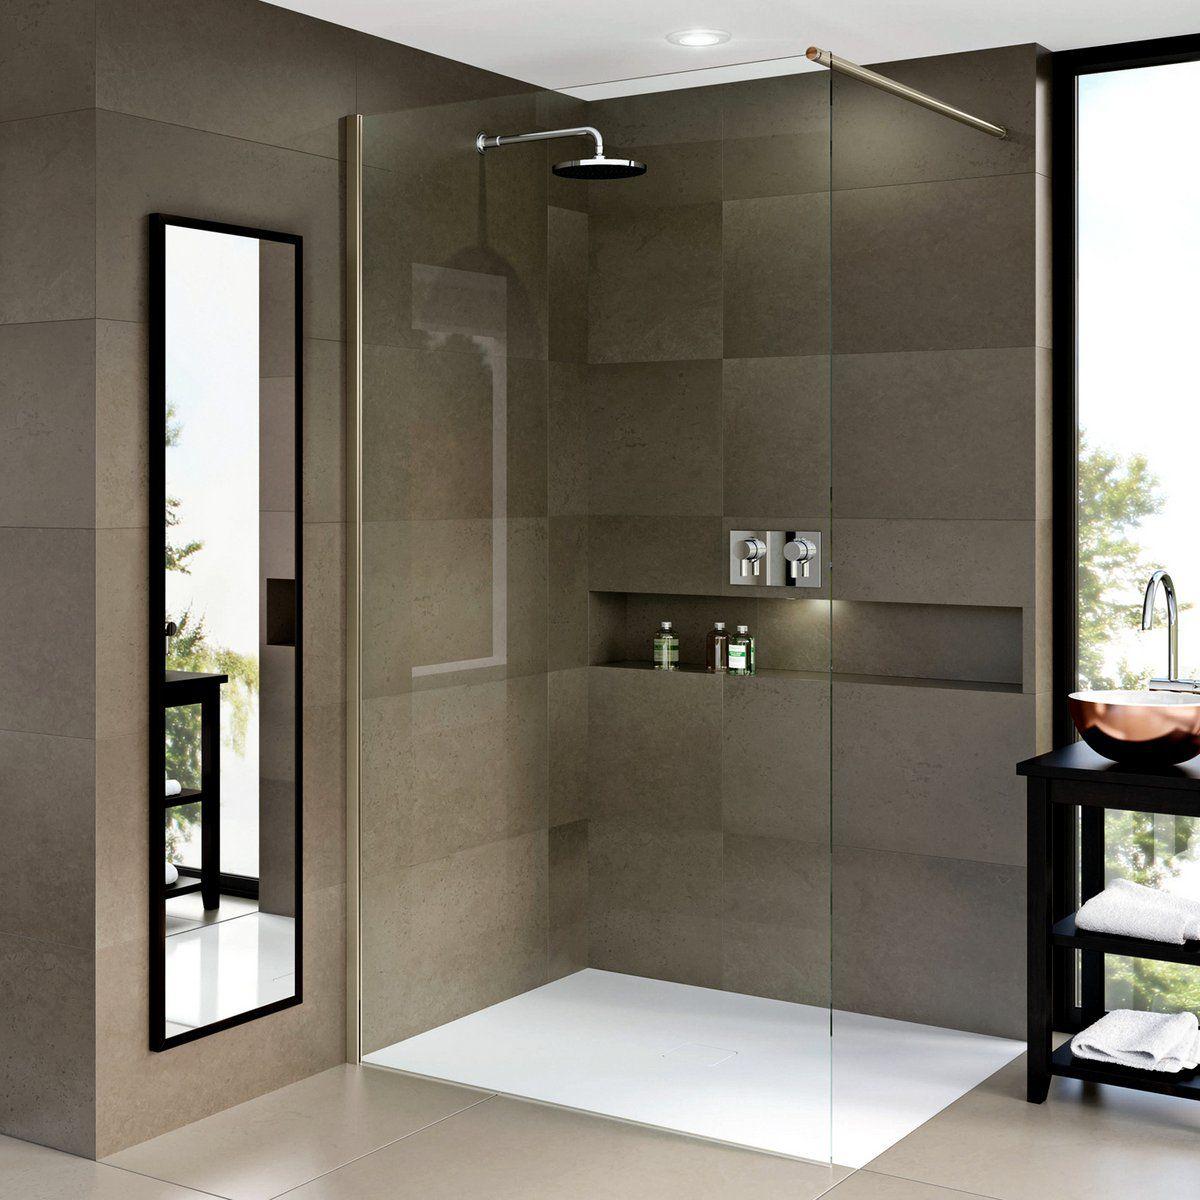 matki one wetroom panel uk bathrooms. Black Bedroom Furniture Sets. Home Design Ideas